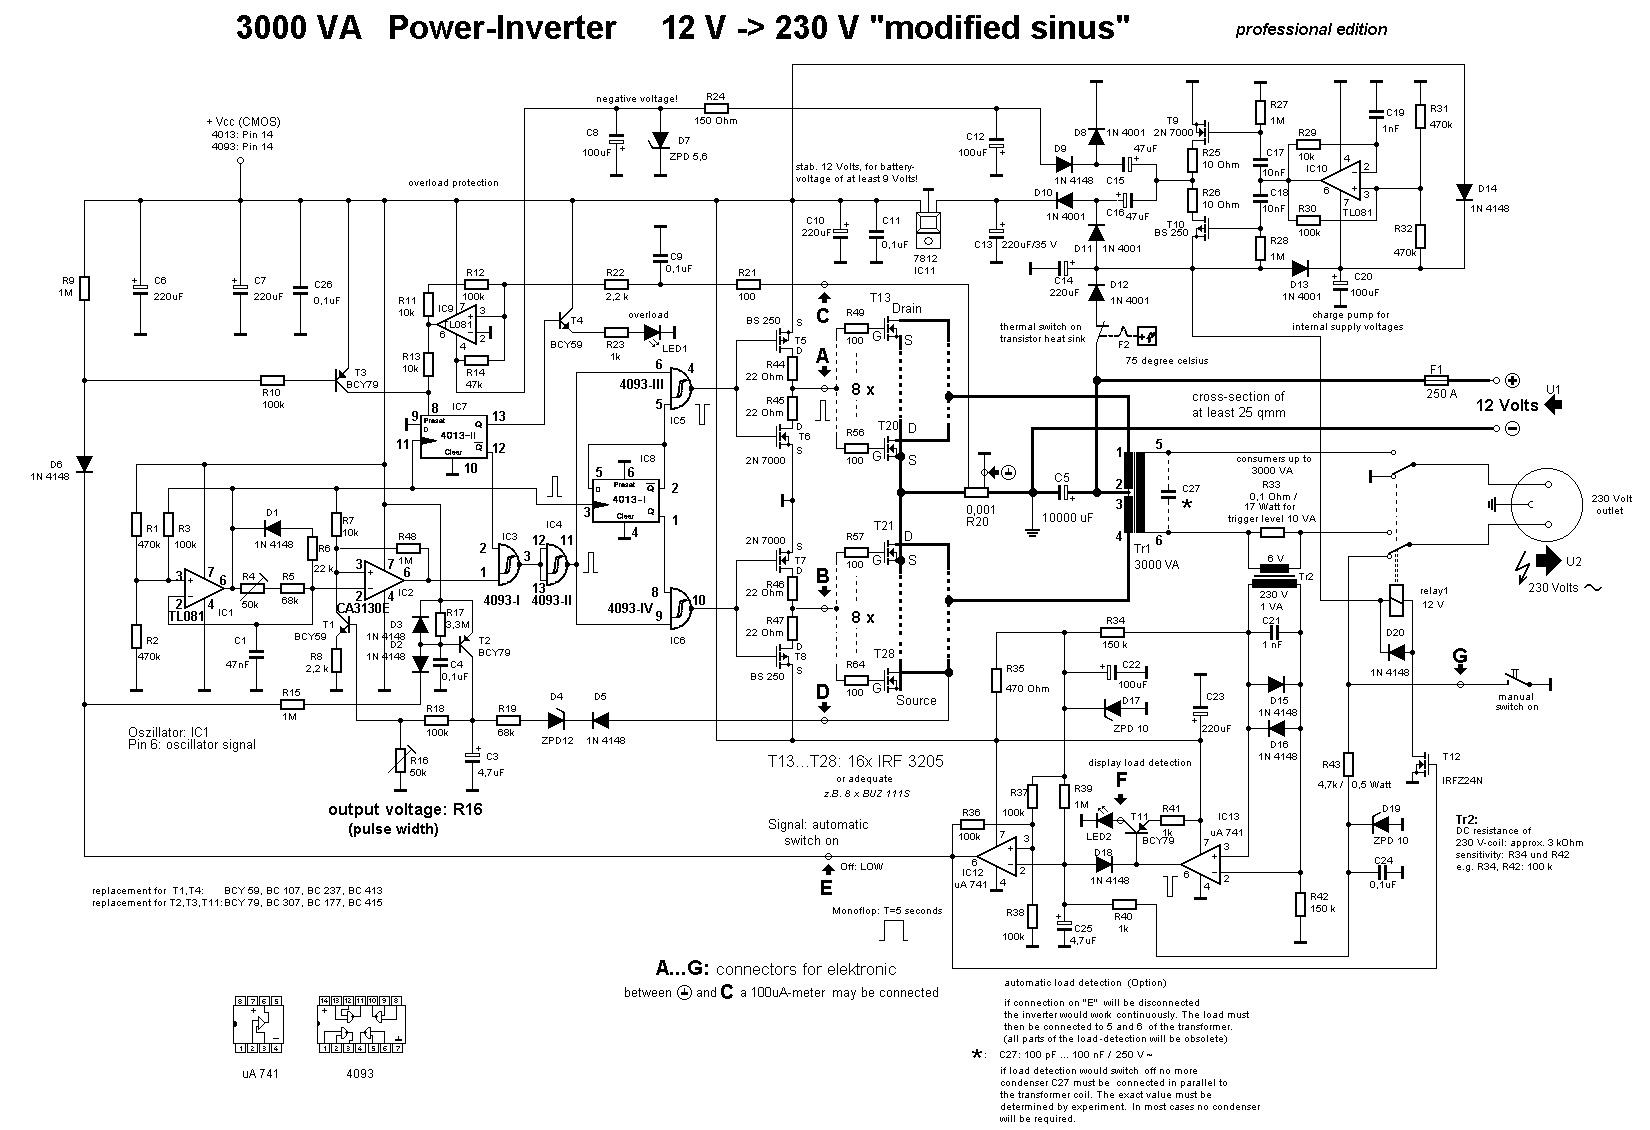 3000W Power Inverter 12V to 230V Scheme - Inverter Circuit ...